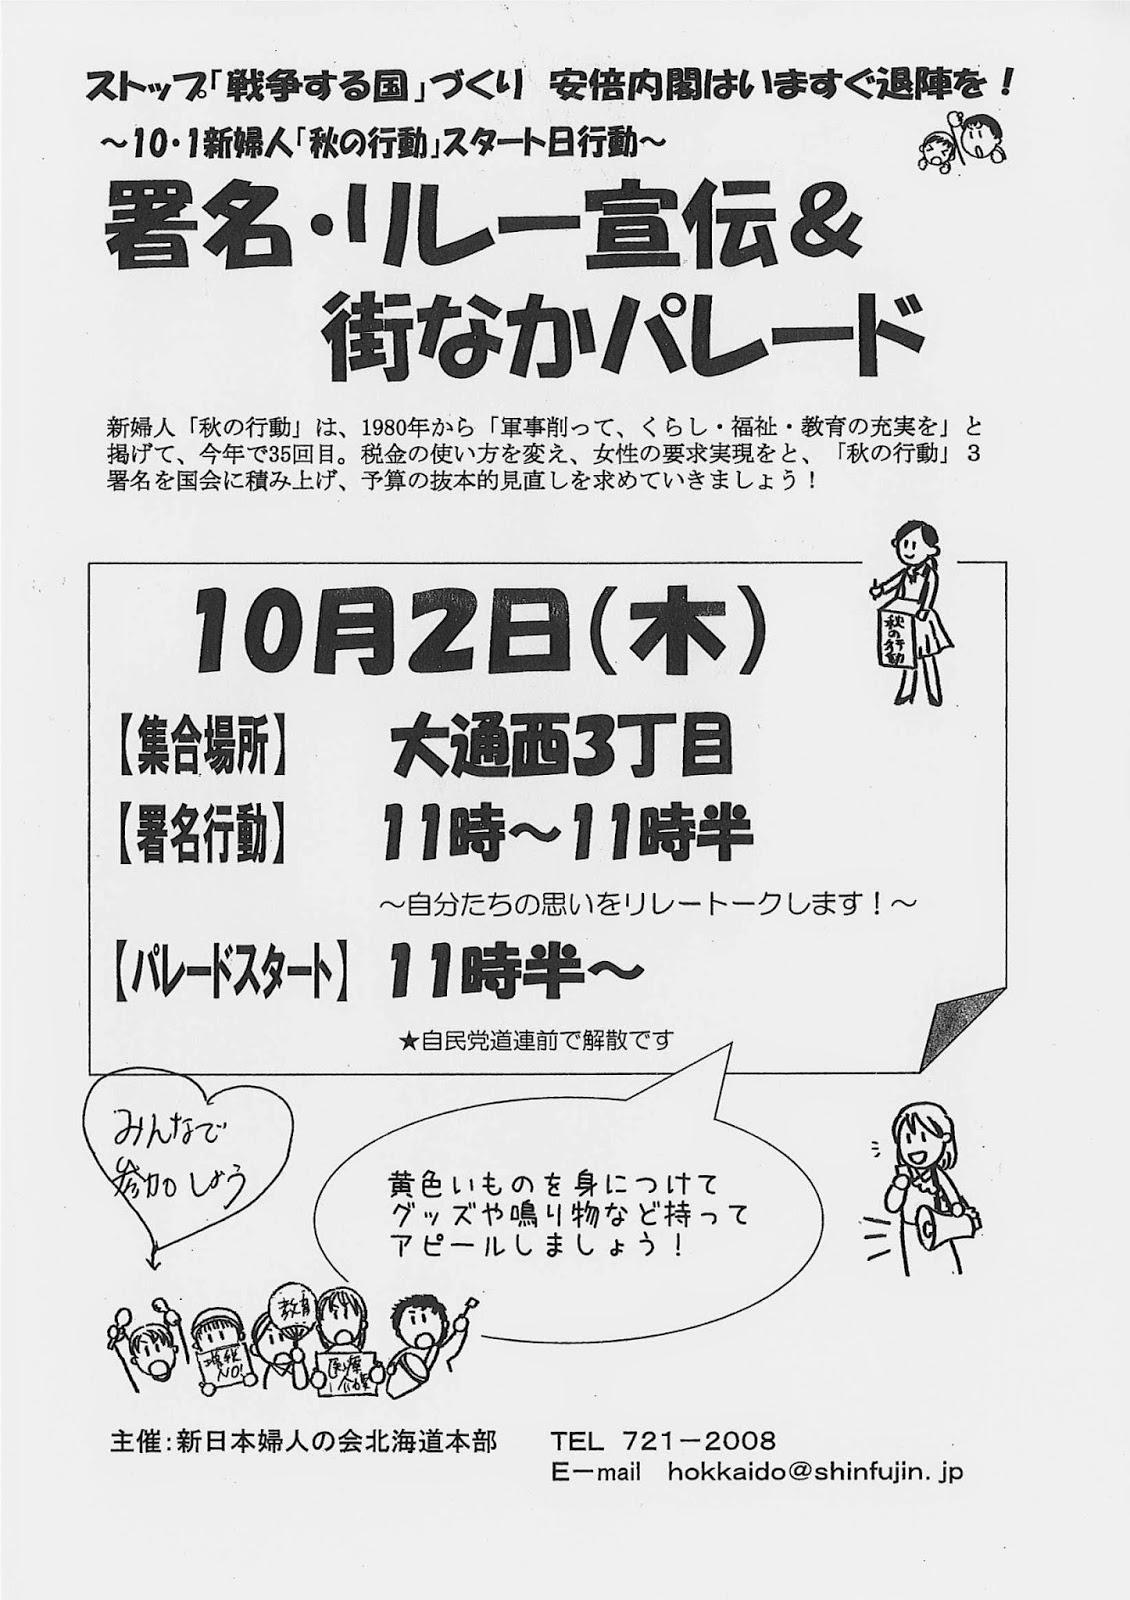 http://shinfujin-hokkaido.com/w/wp-content/uploads/2014/10/DOC141001-20141001111029.pdf